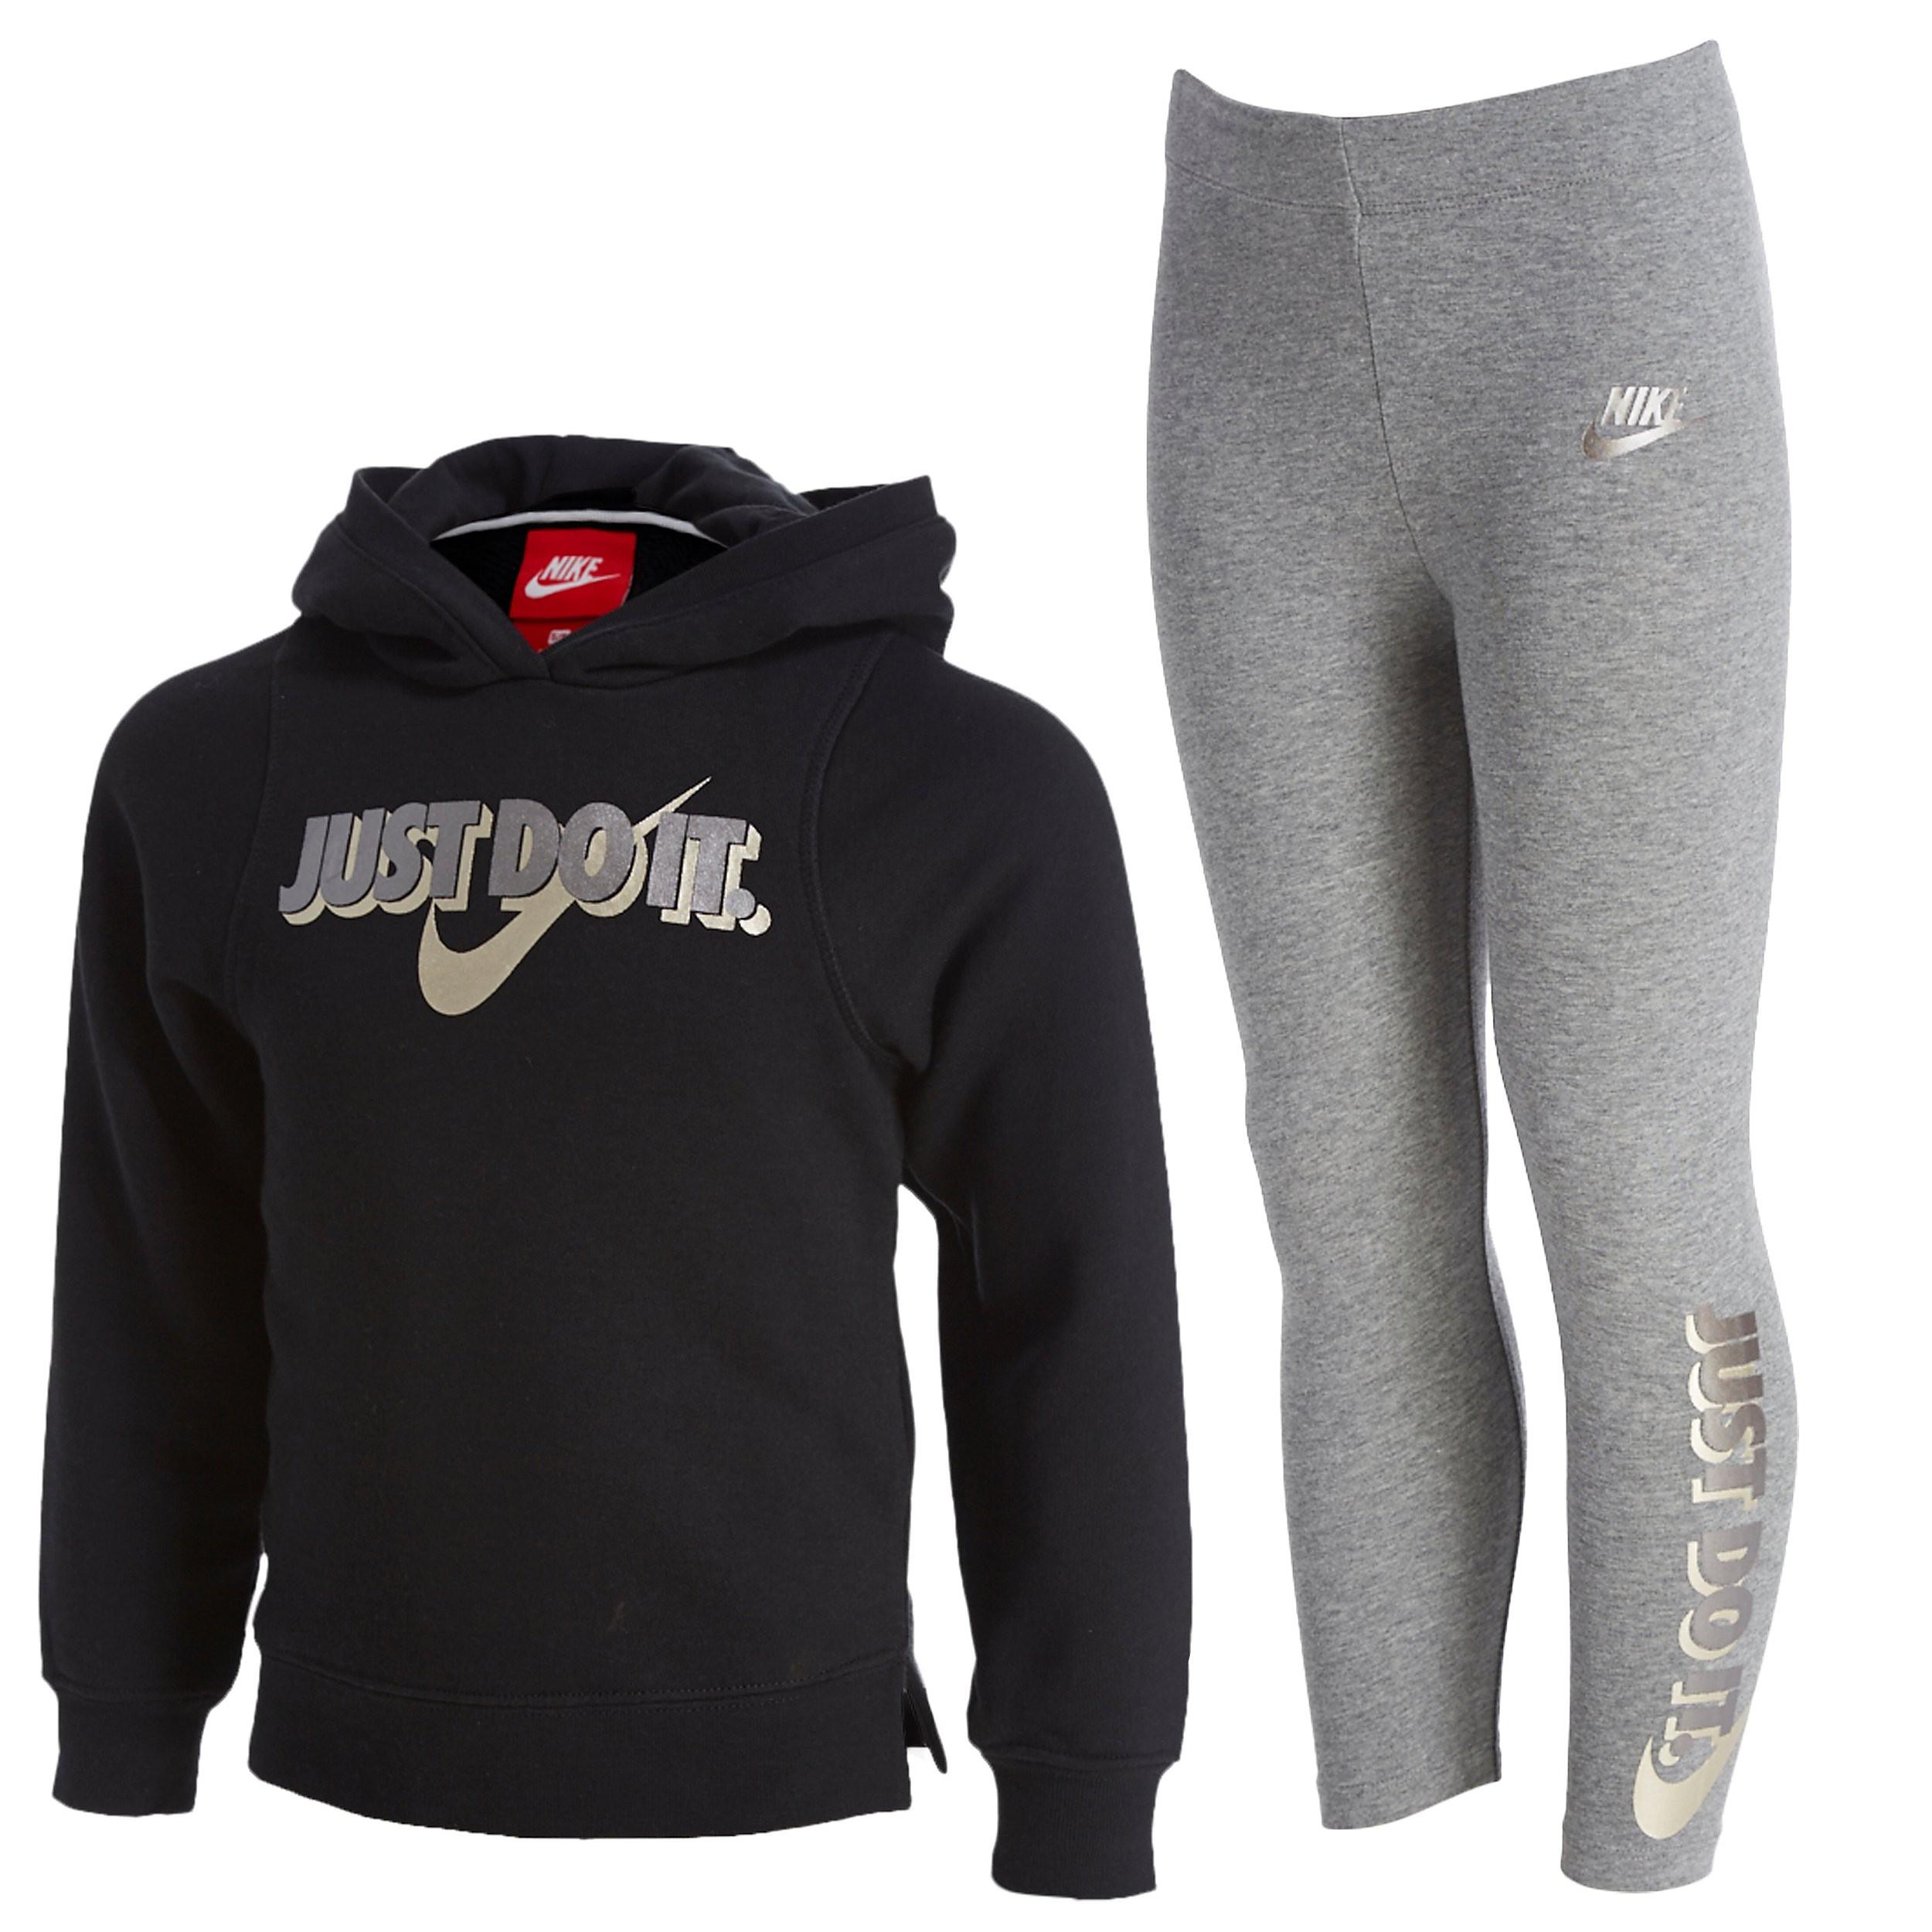 Nike Mädchen Just Do It Hoodie/Leggings Set Kinder